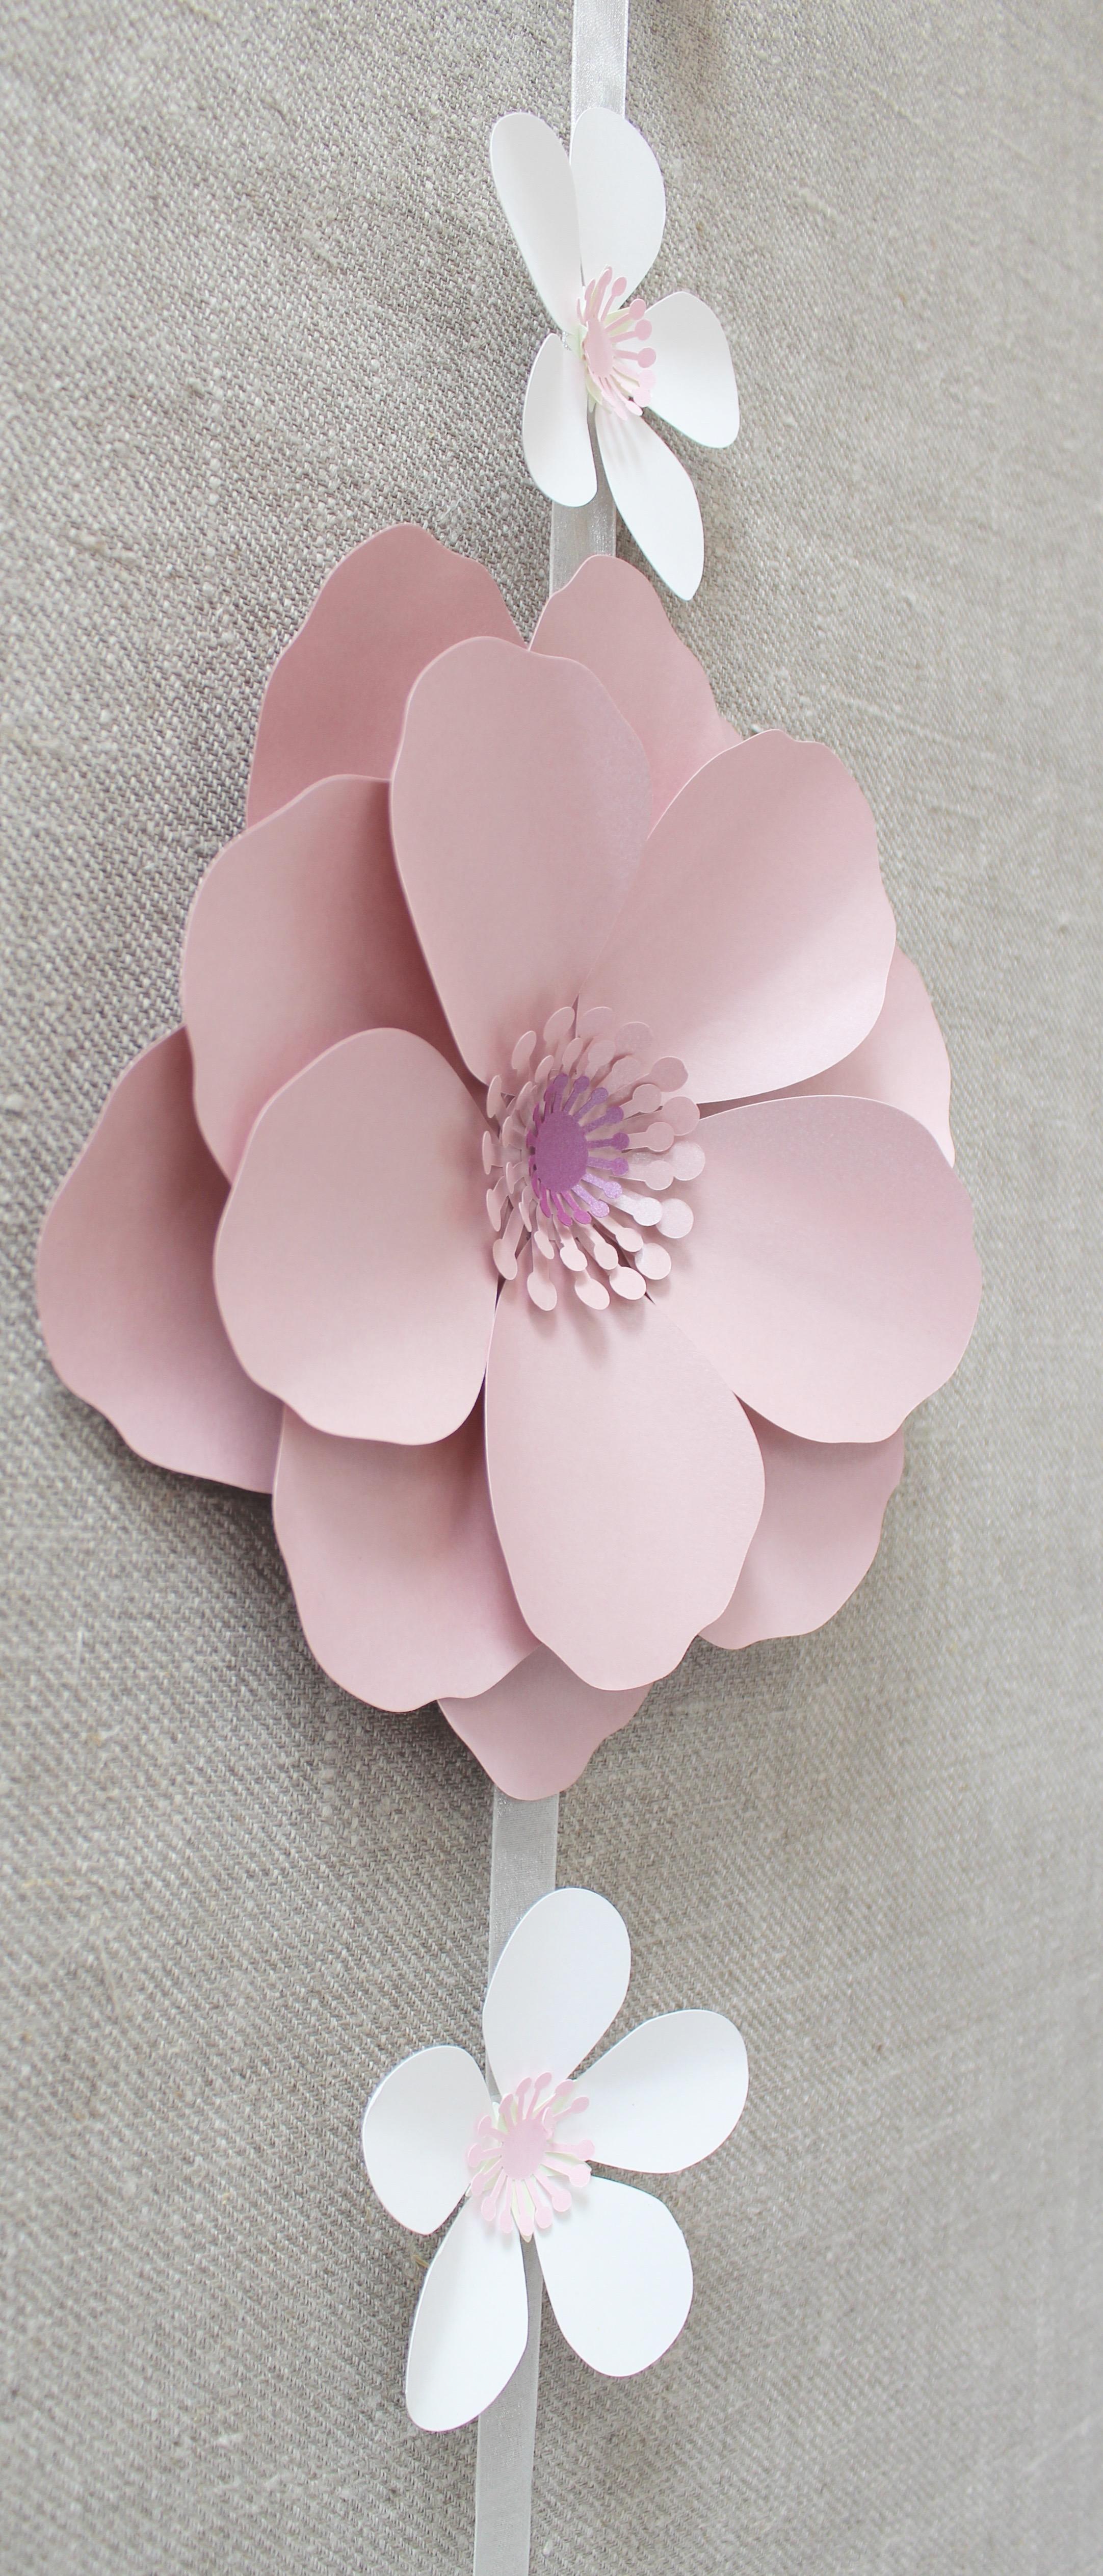 Pink paper peony garland